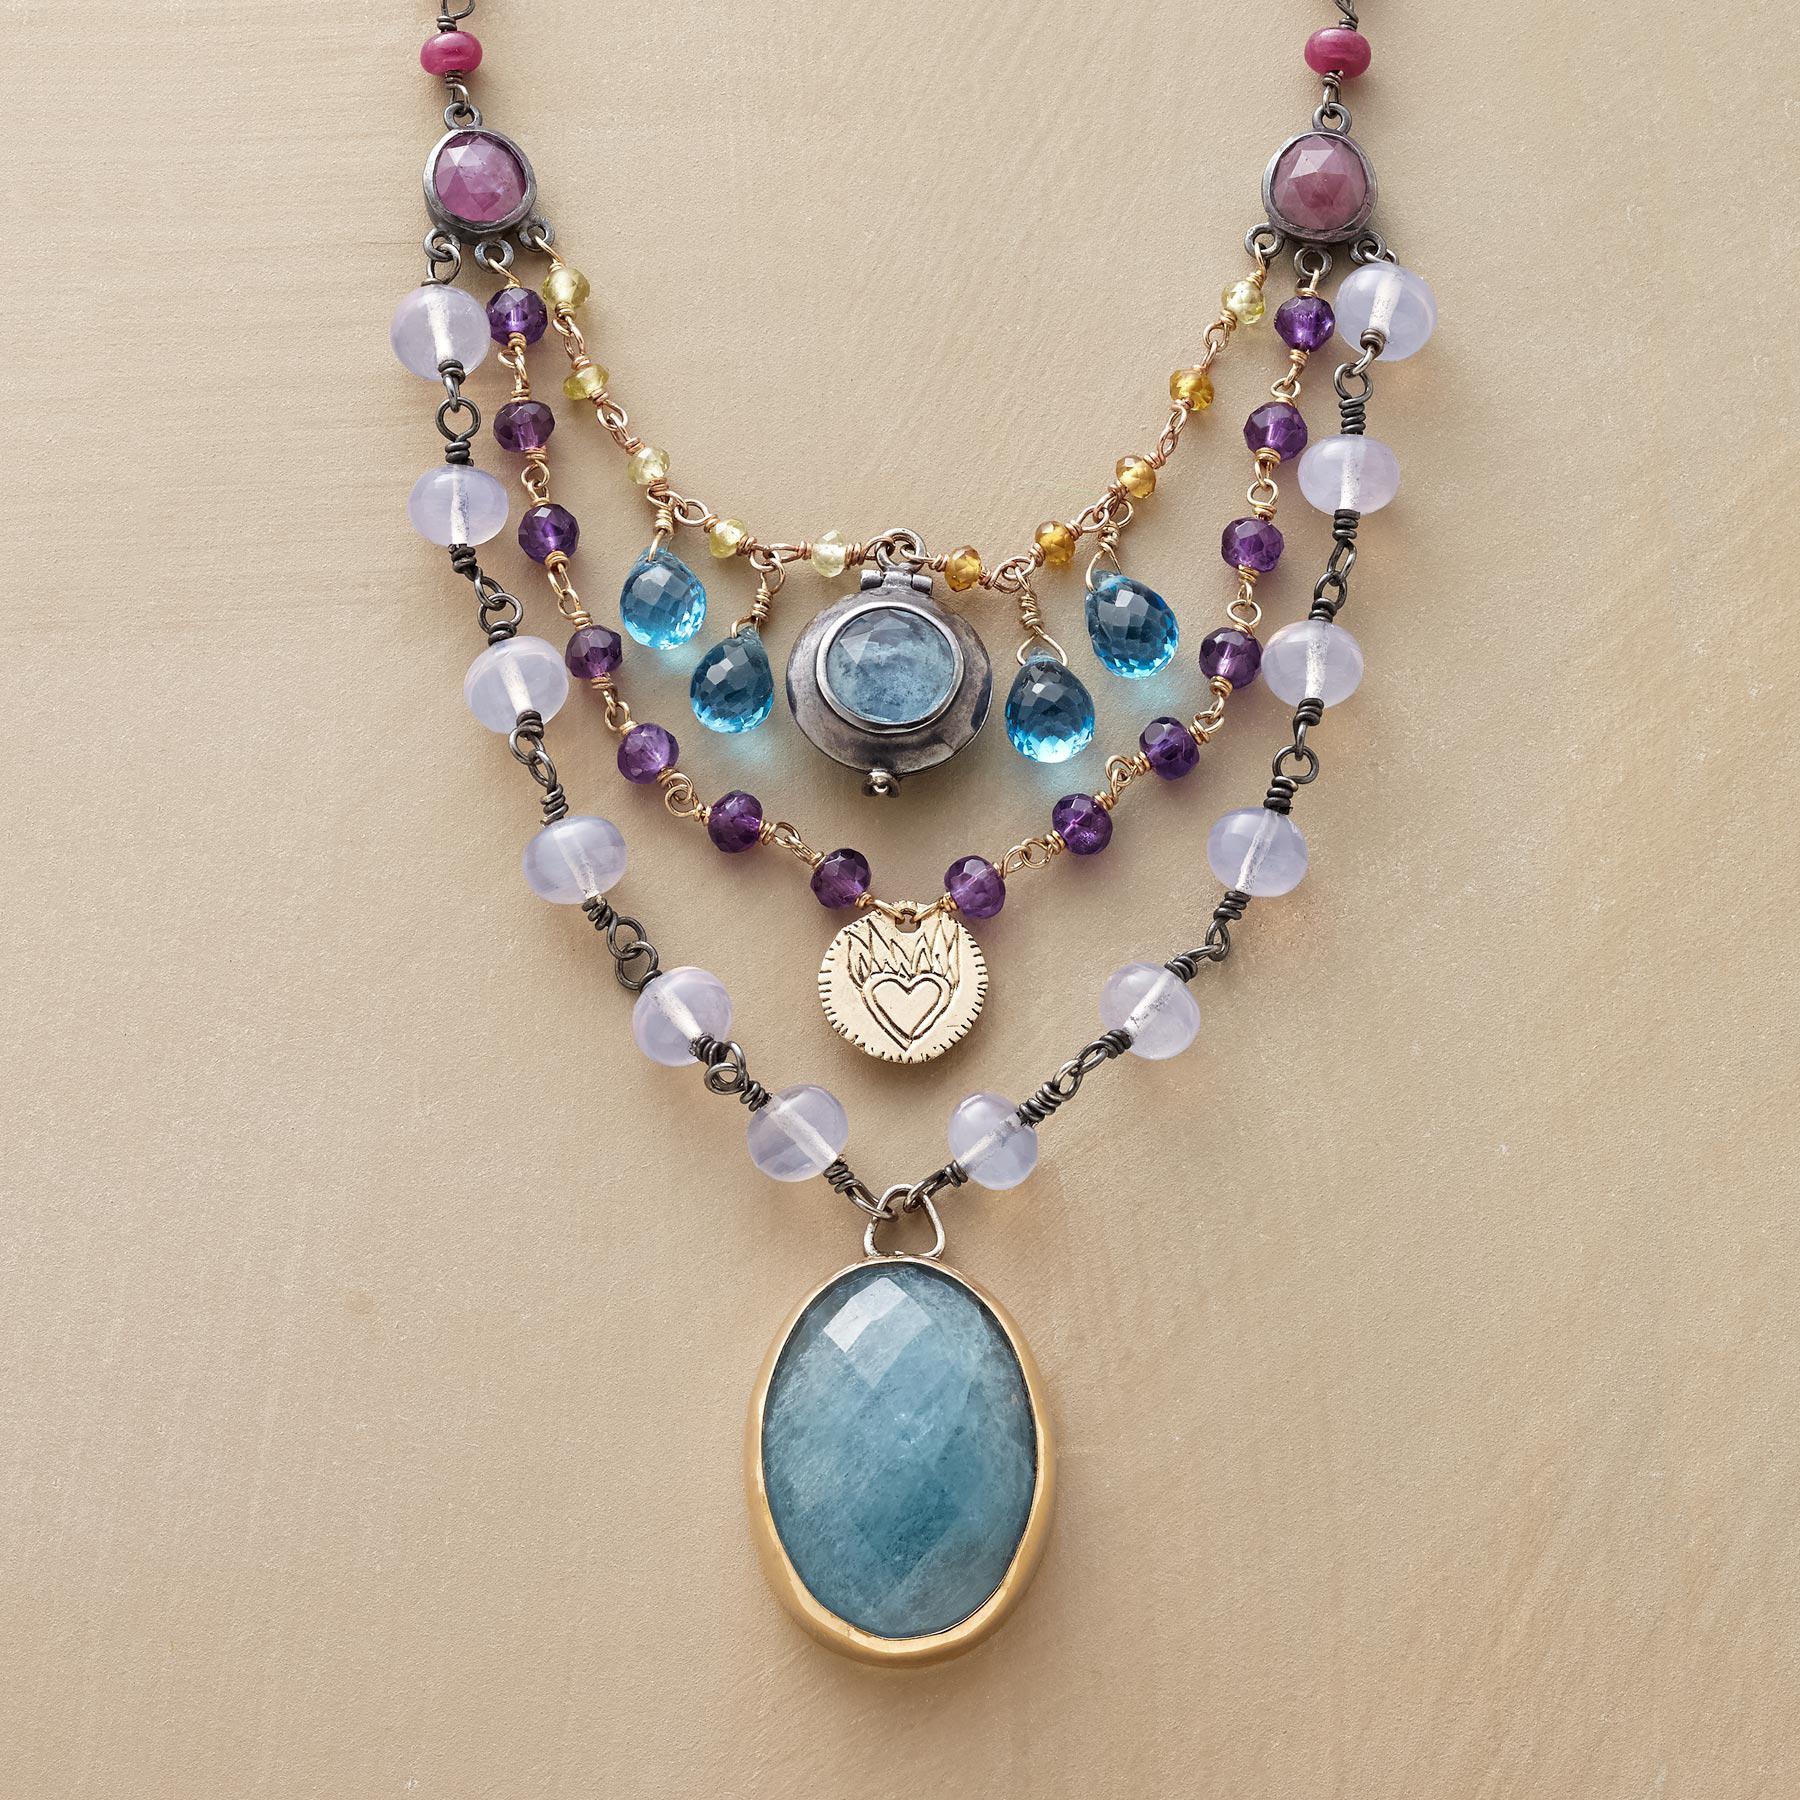 Poseidon's Treasures Necklace